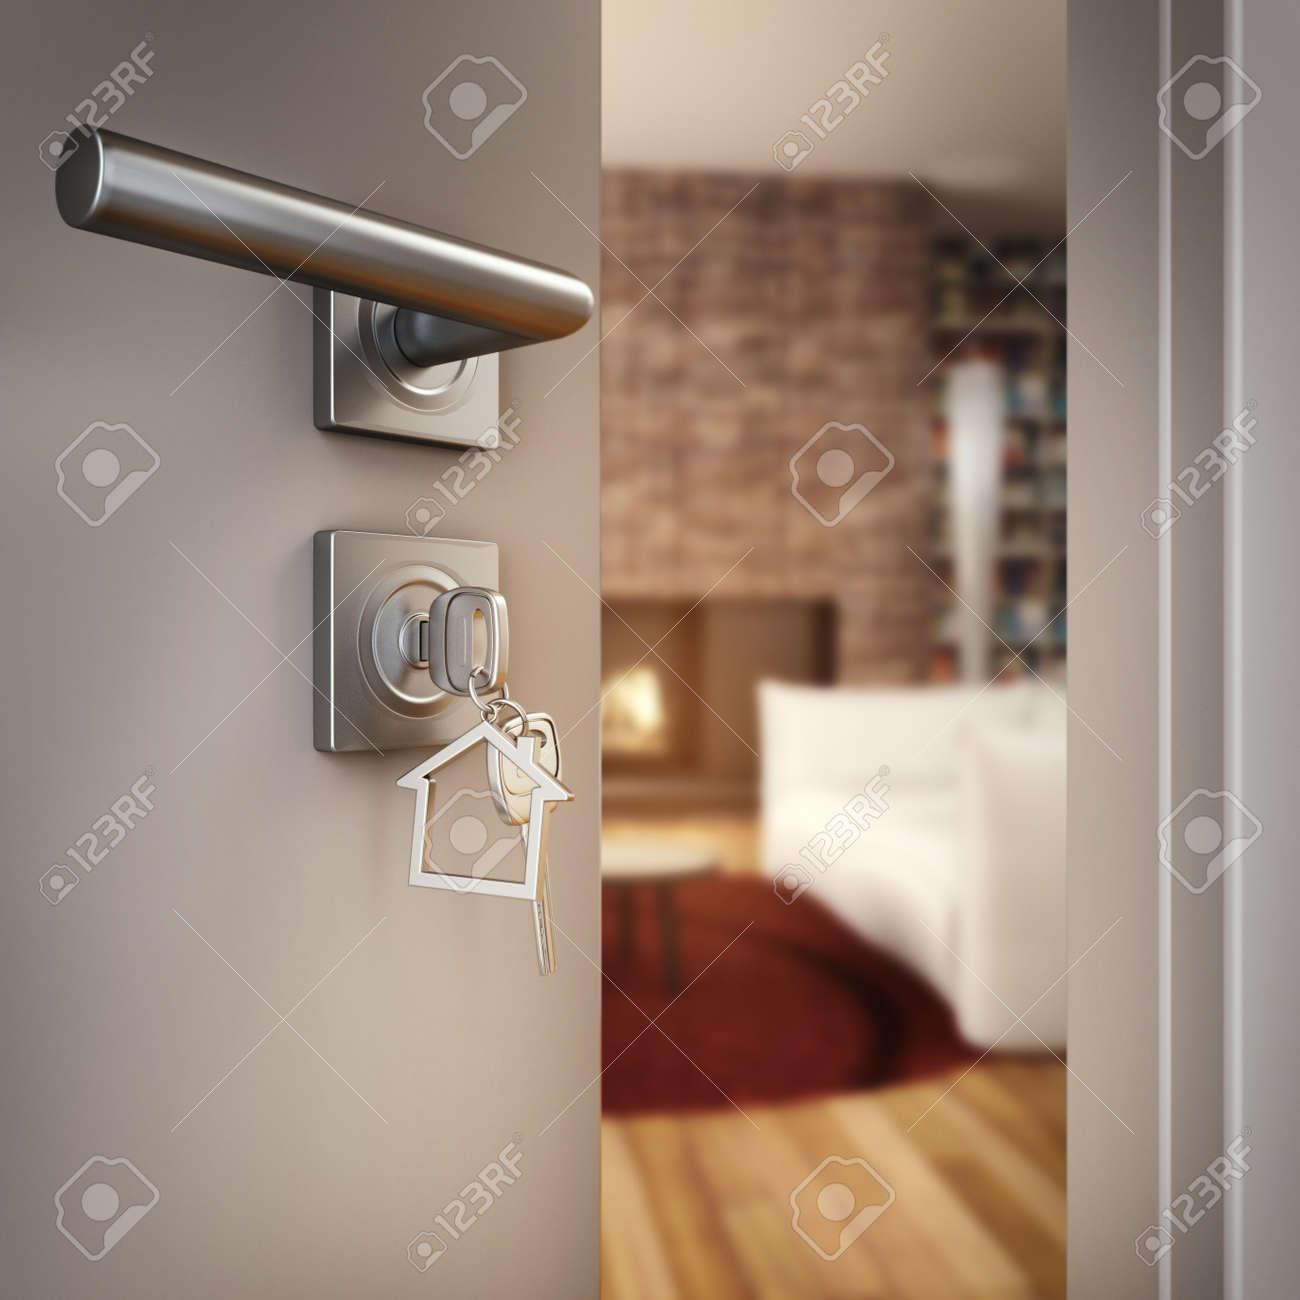 3D Rendering Open door with key on the living room of a house Standard-Bild - 66762568